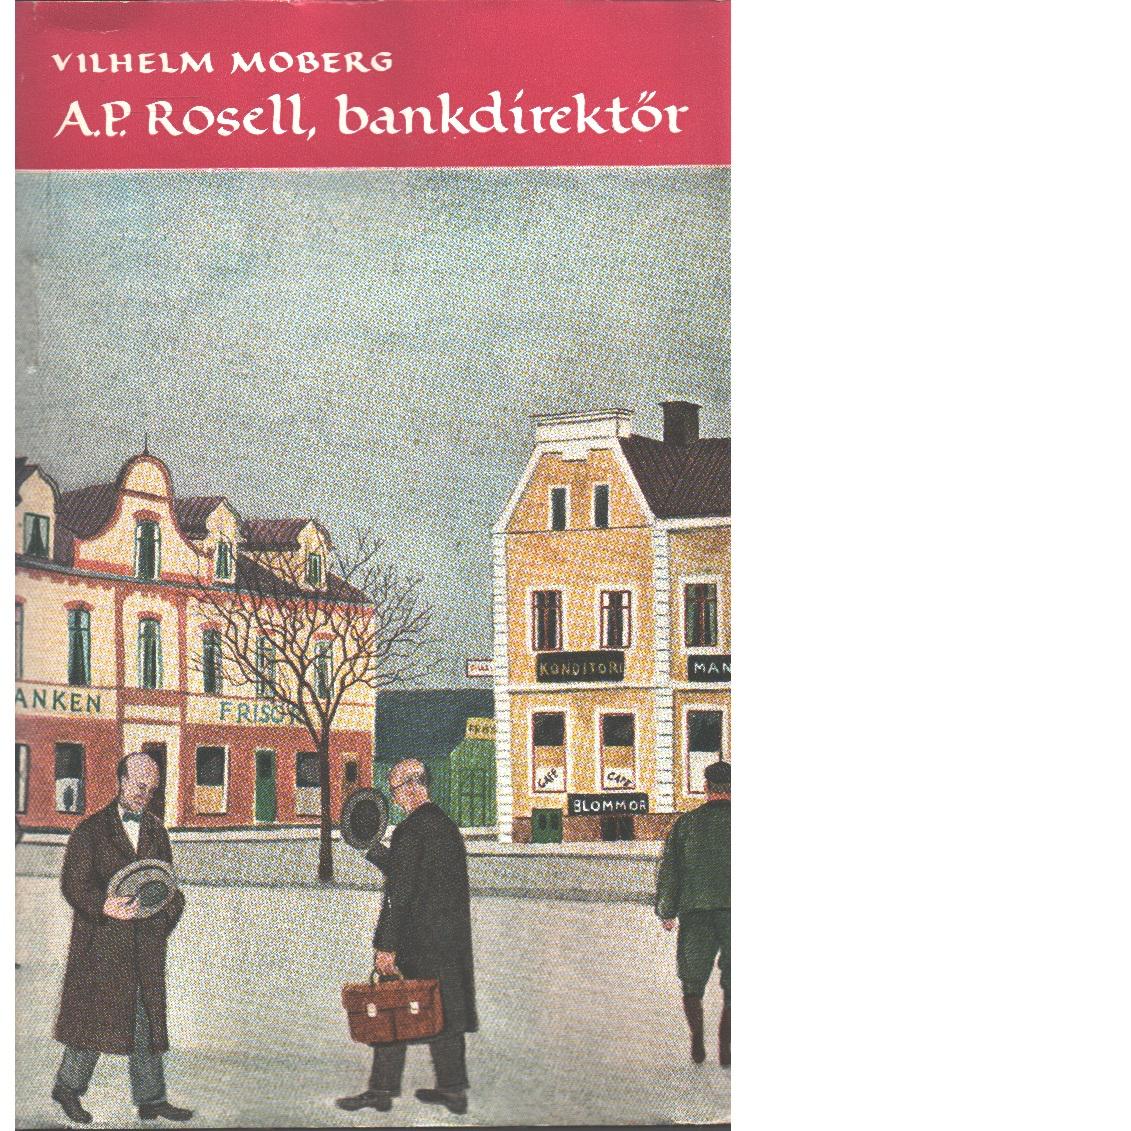 A. P. Rosell, bankdirektör  - Moberg, Vilhelm